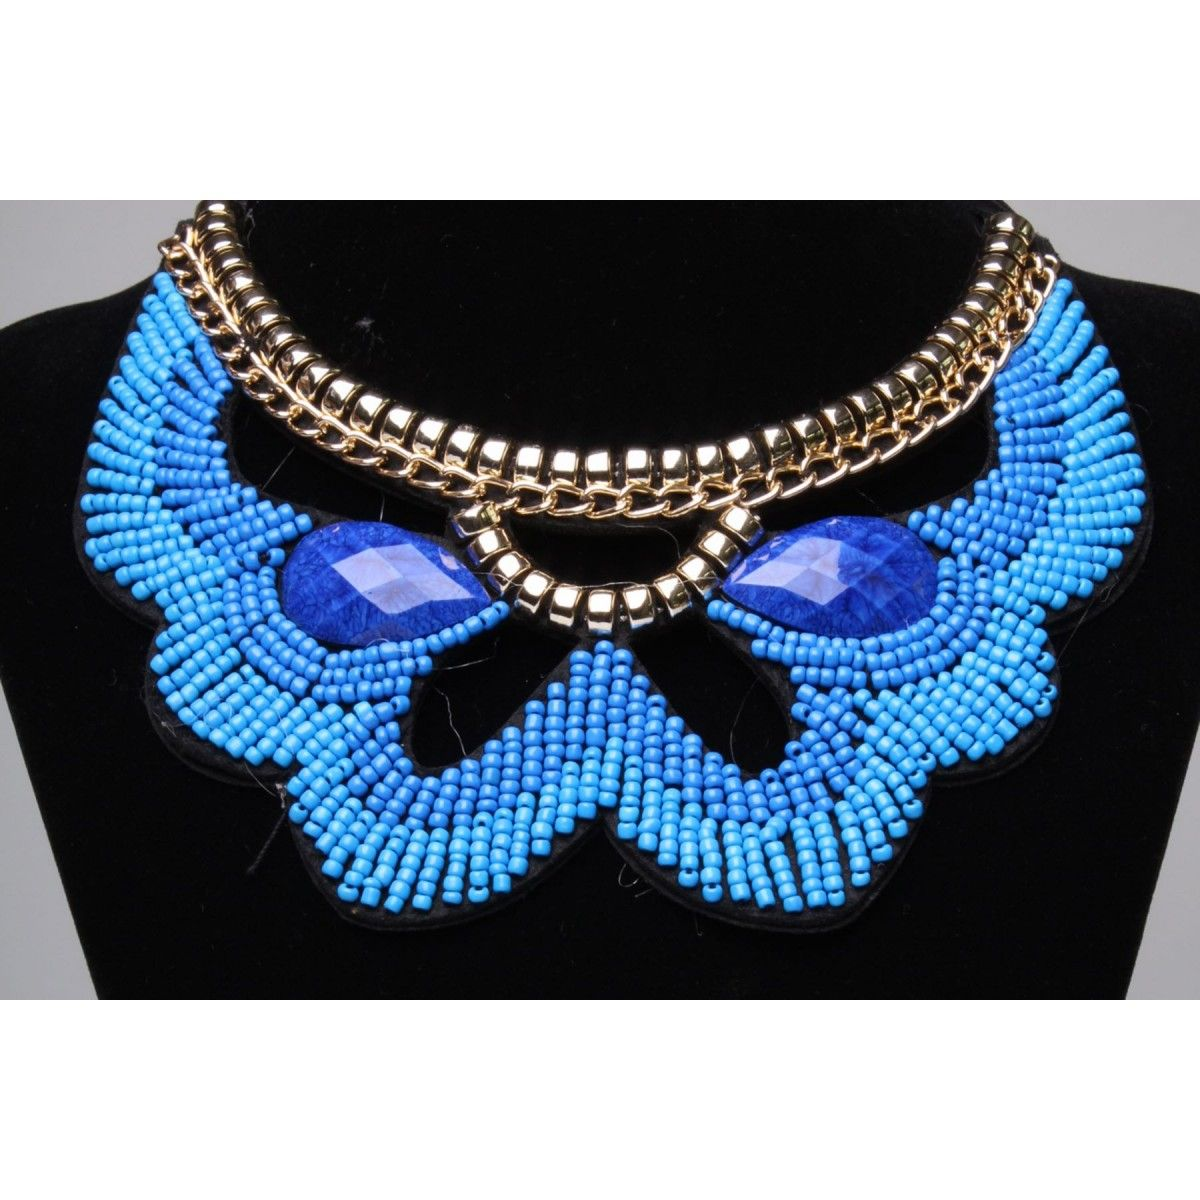 "Collier ras du cou, bleu royal, "" Fleur Bleu"", avec perles"